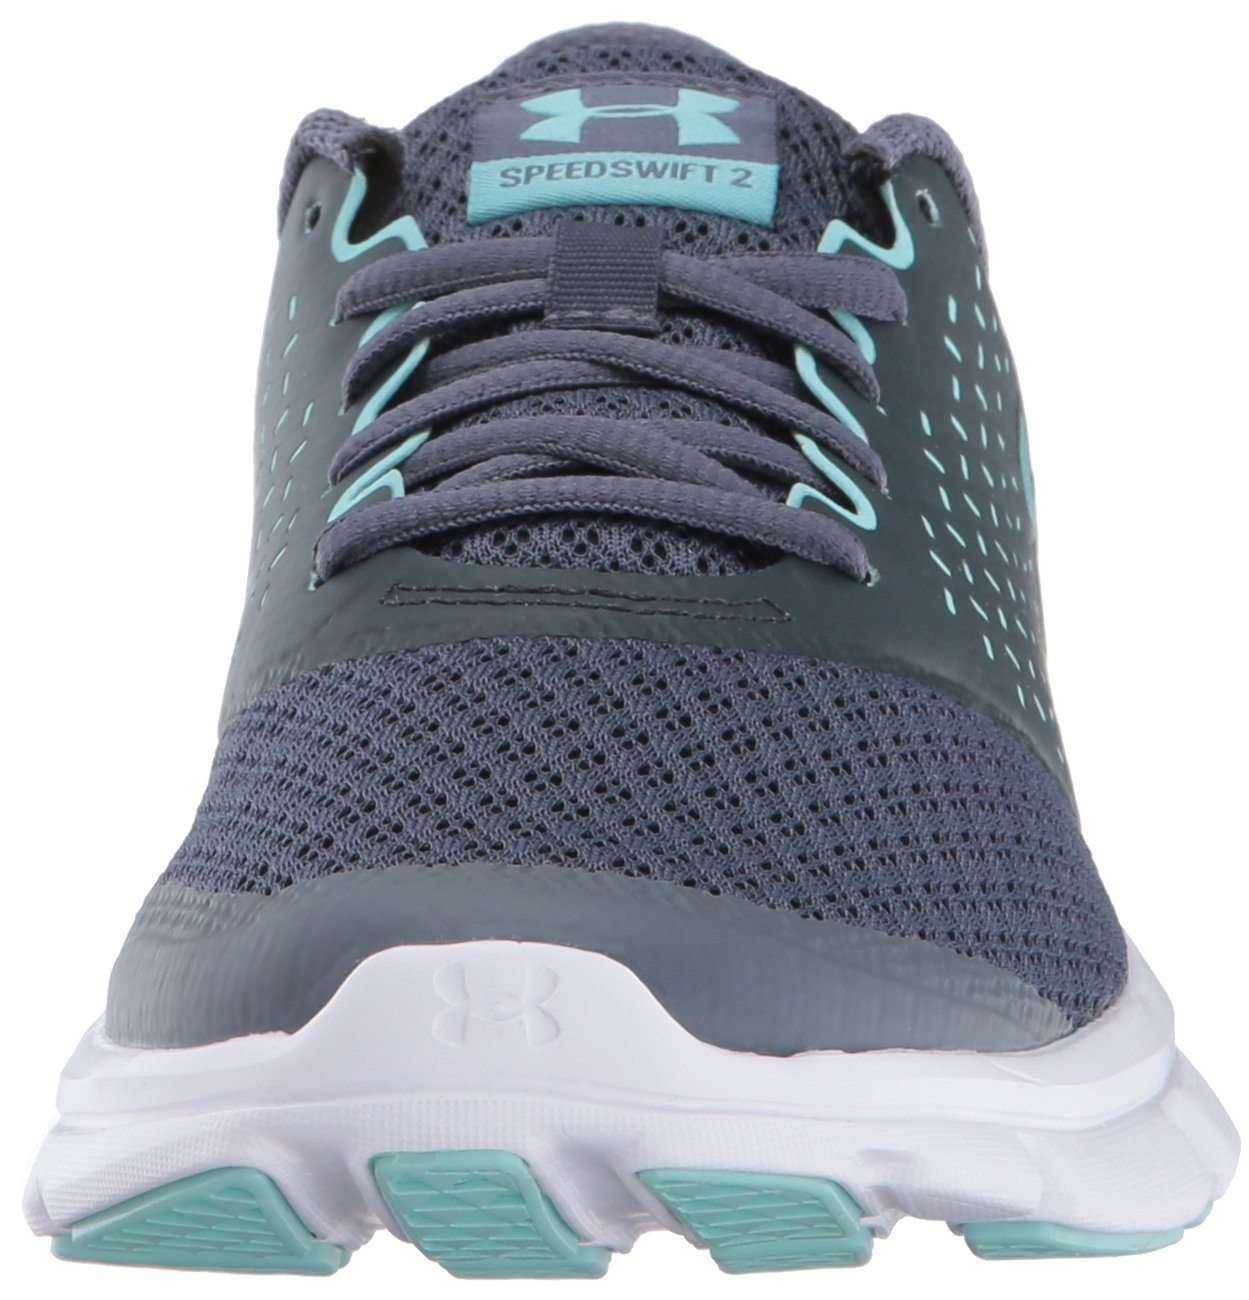 Under Armour Women's Speed Swift 2 Running Shoe B01N9FZH1X 6 M US|Apollo Gray (101)/Stealth Gray